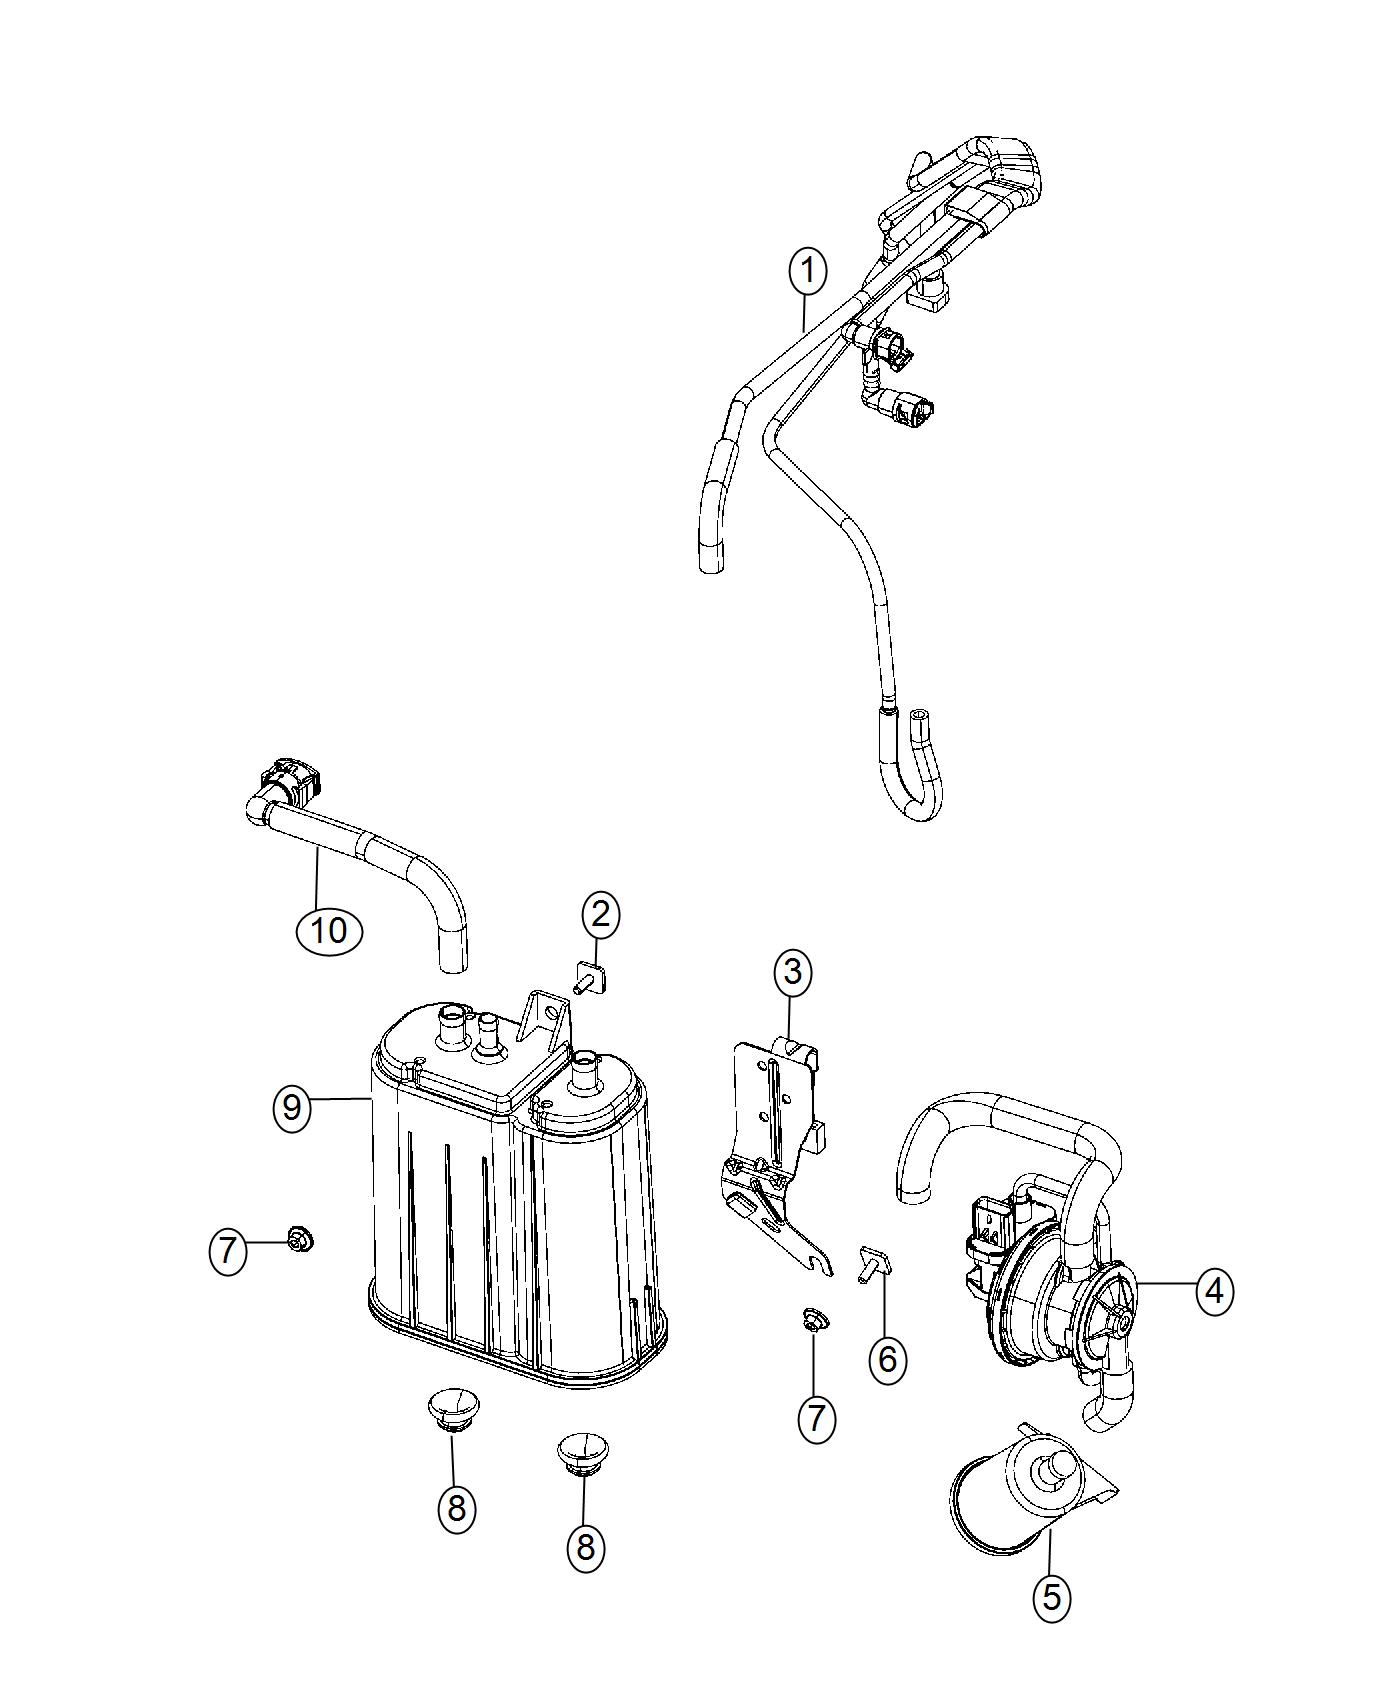 2017 Dodge Viper Bolt. Leak detection pump bracket mtg